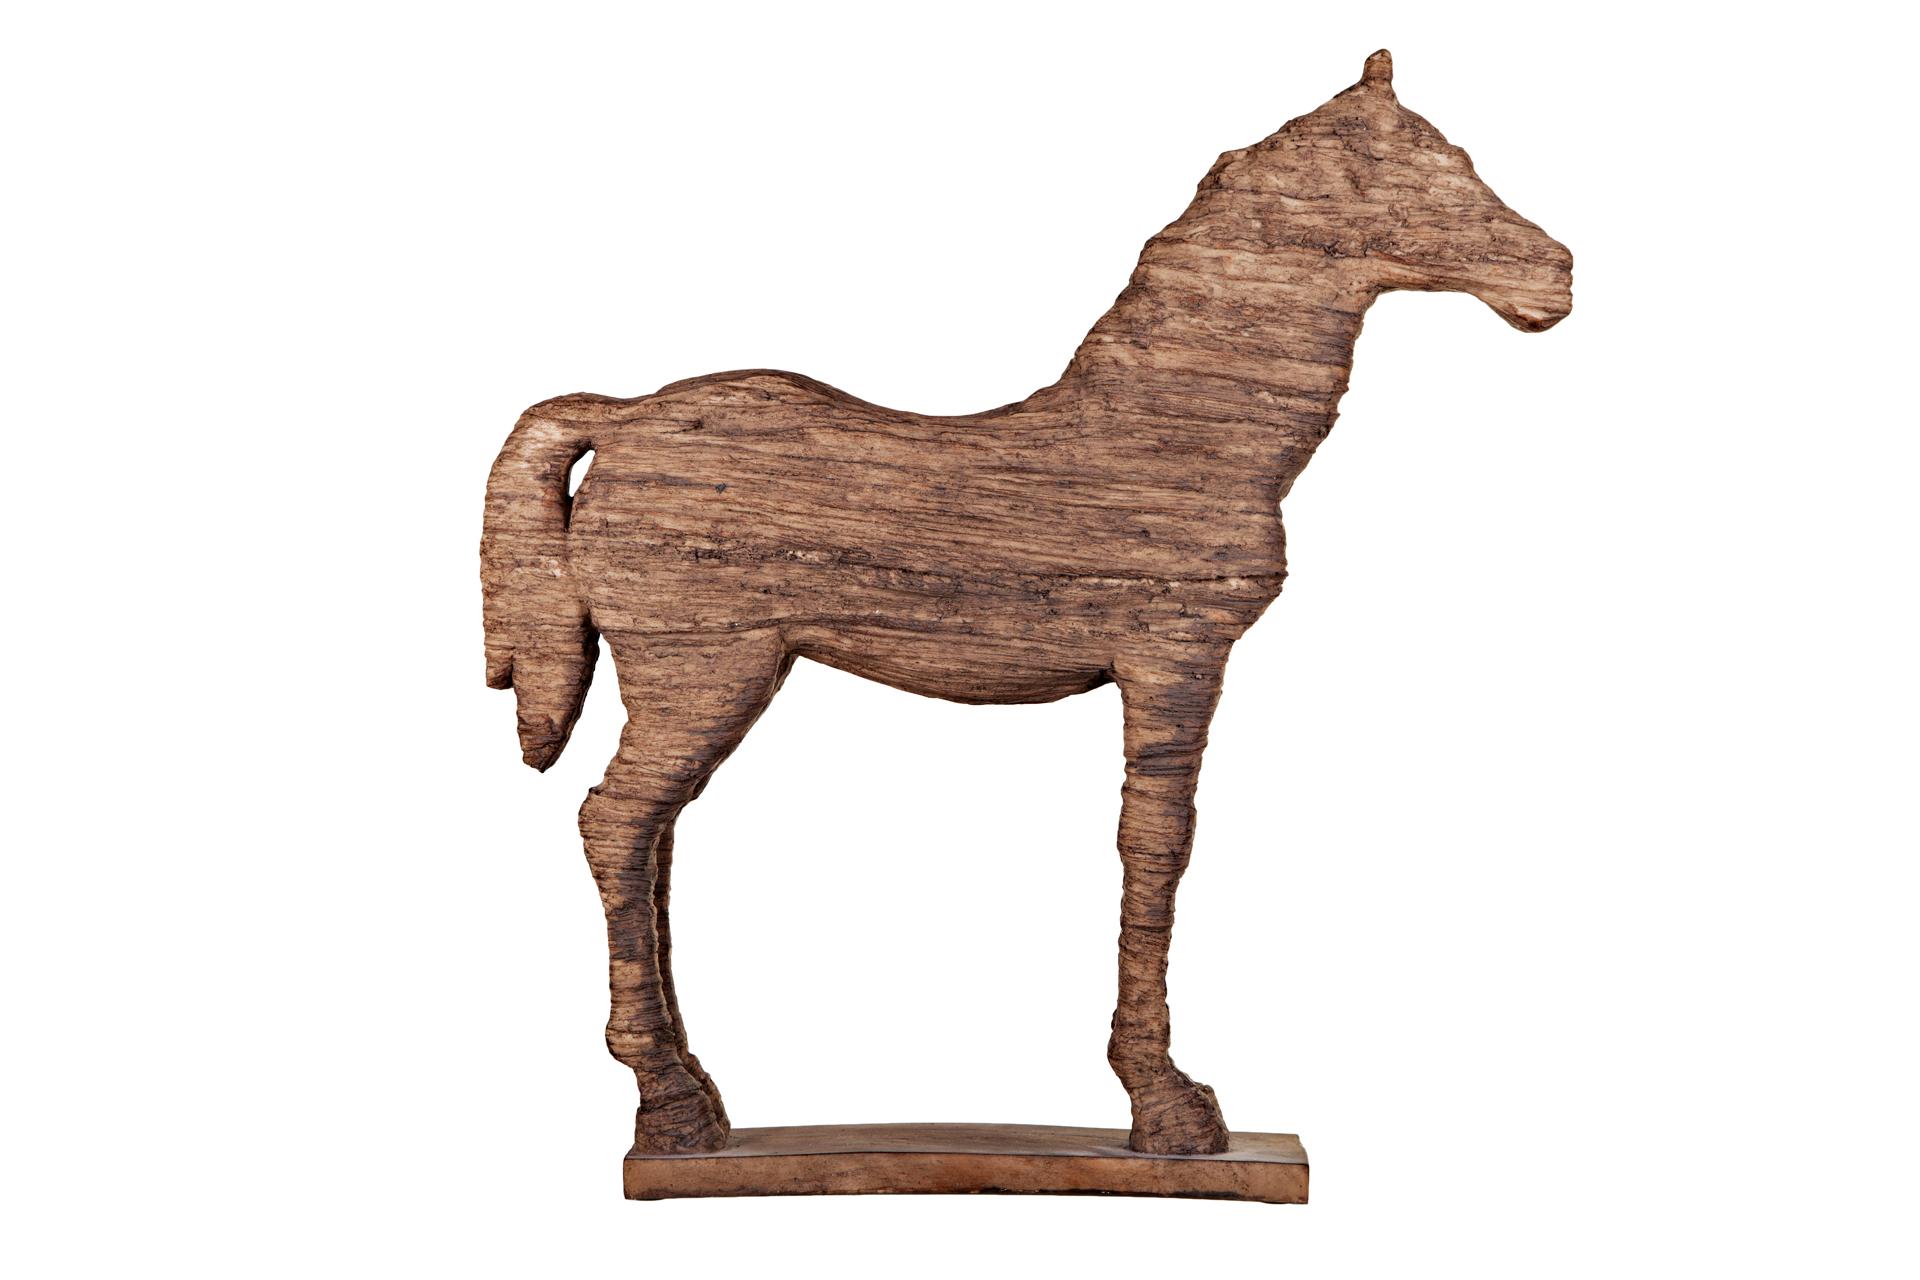 {} ARTEVALUCE Статуэтка Лошадь (7х48х49 см) статуэтка африканка федерация статуэтка африканка